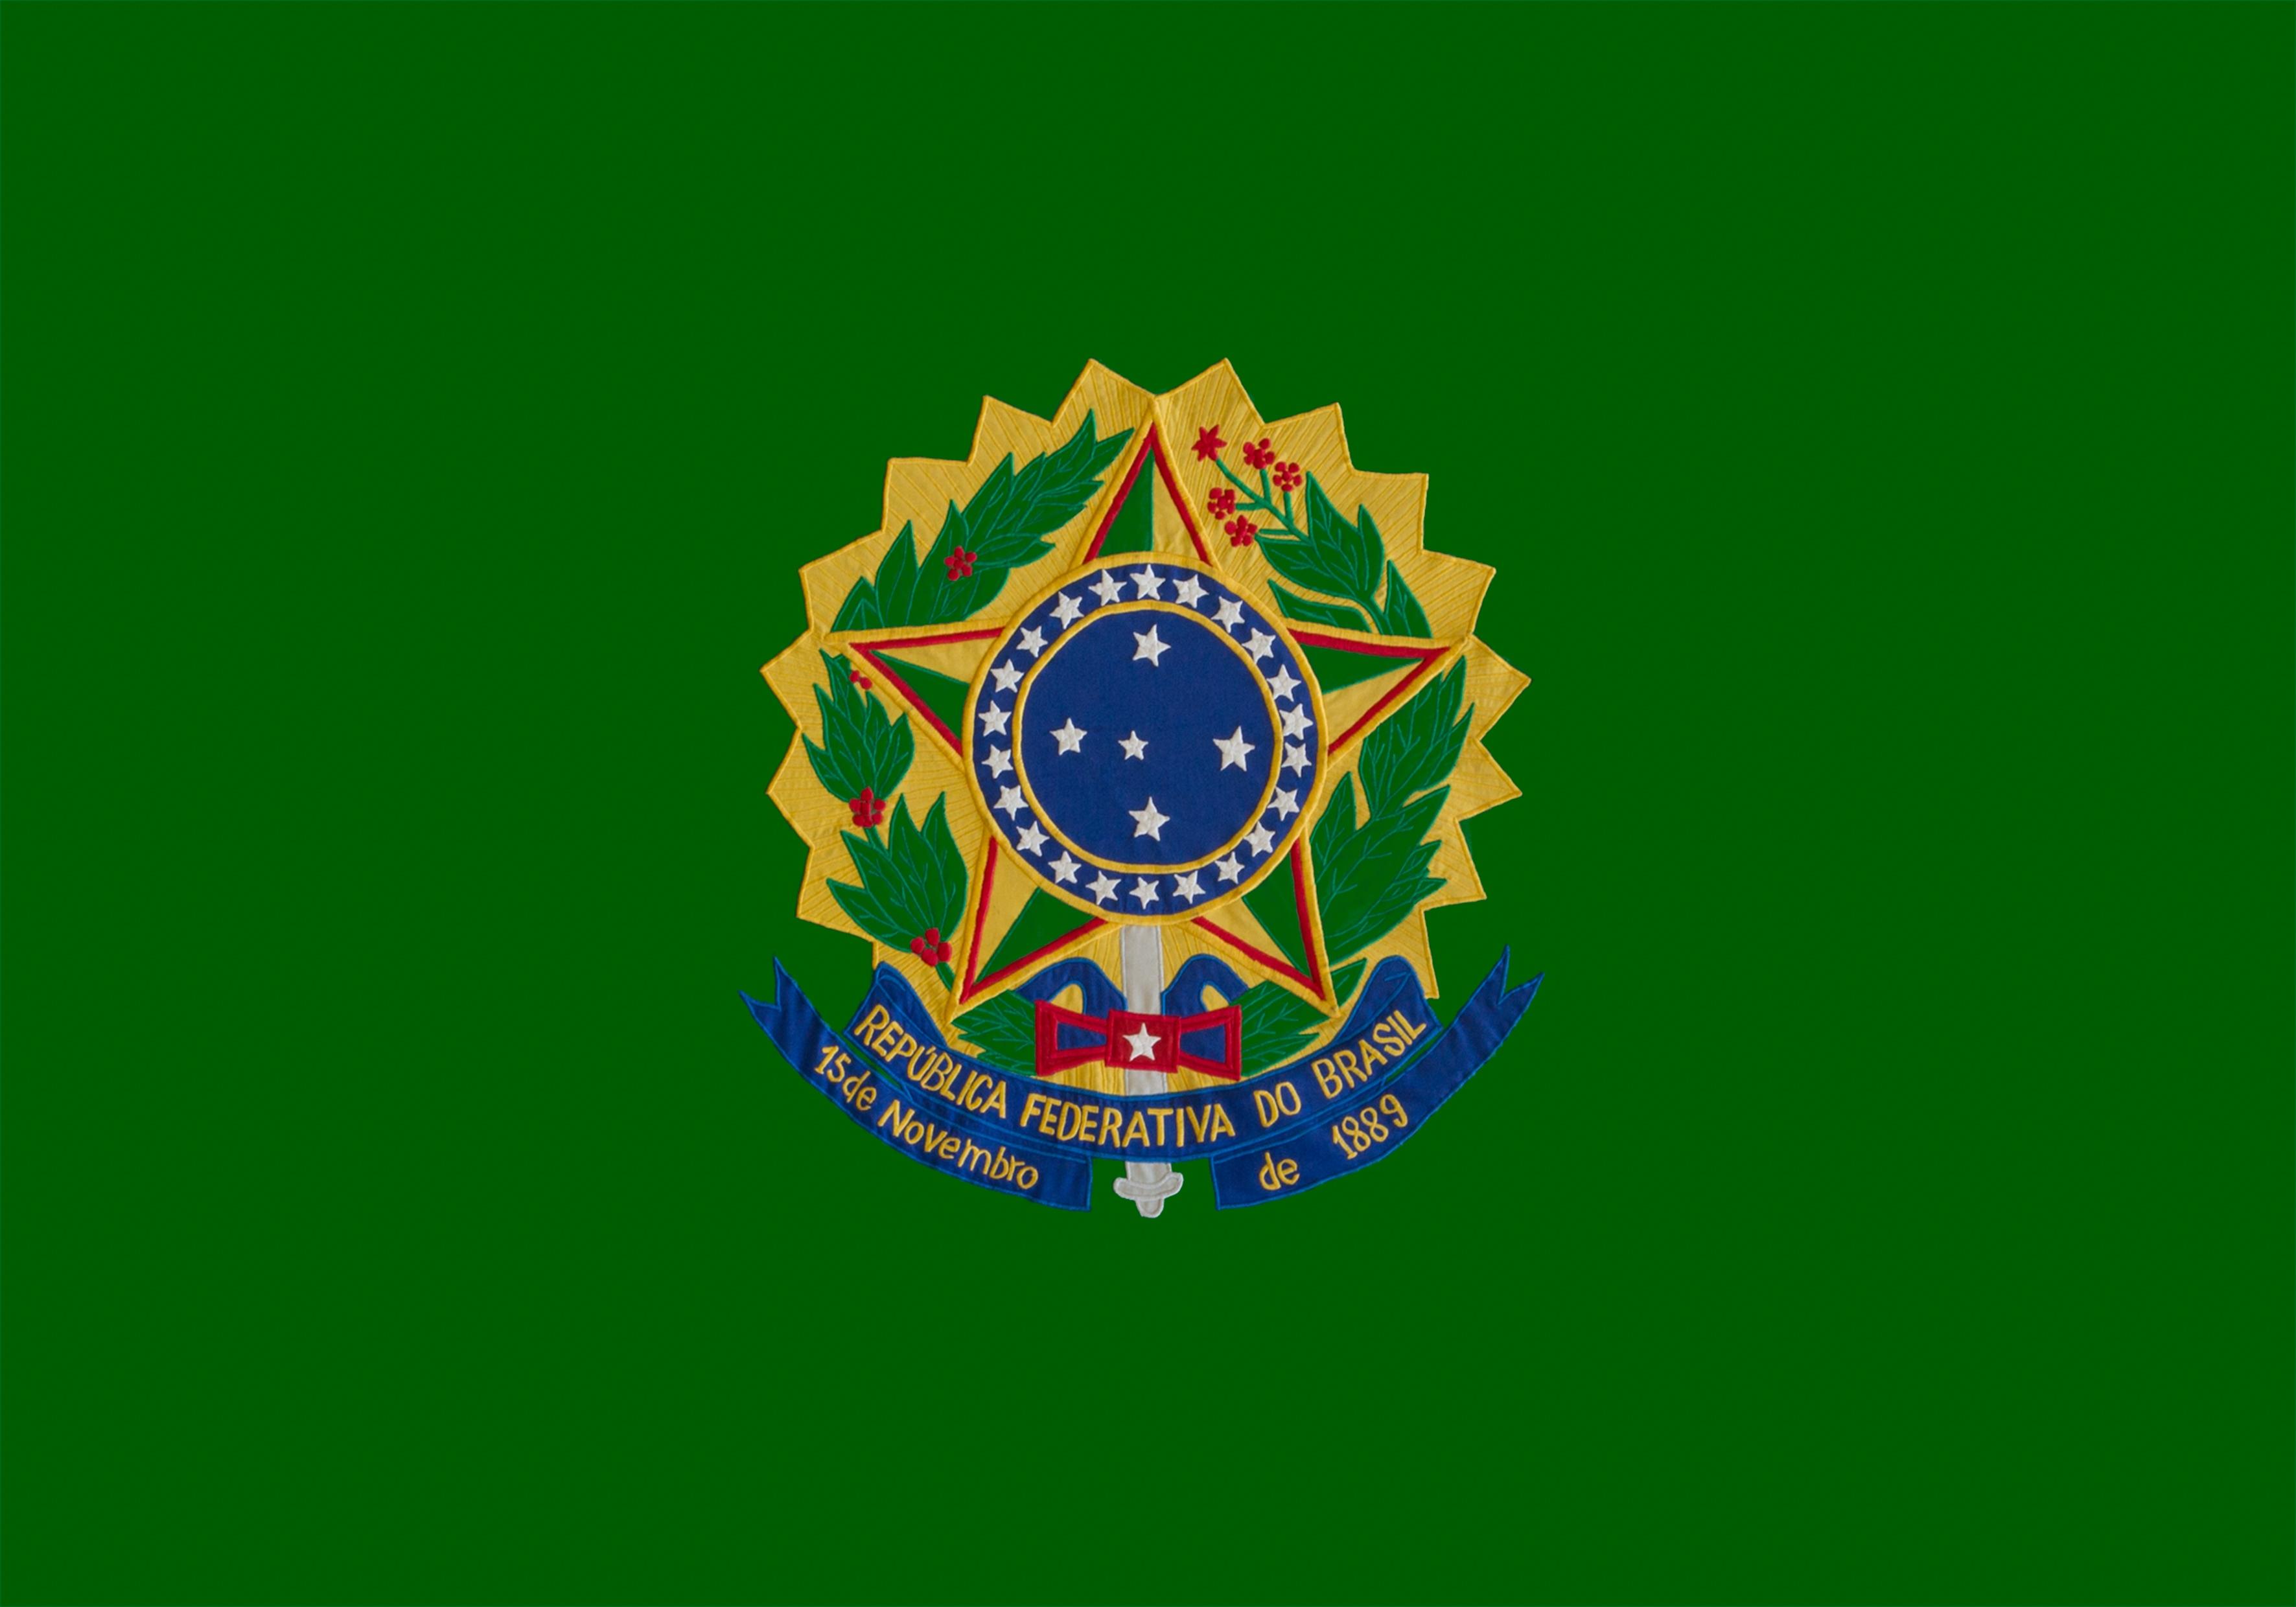 A Primeira Bandeira Do Brasil Republica conheça as bandeiras que o brasil já teve ao longo da